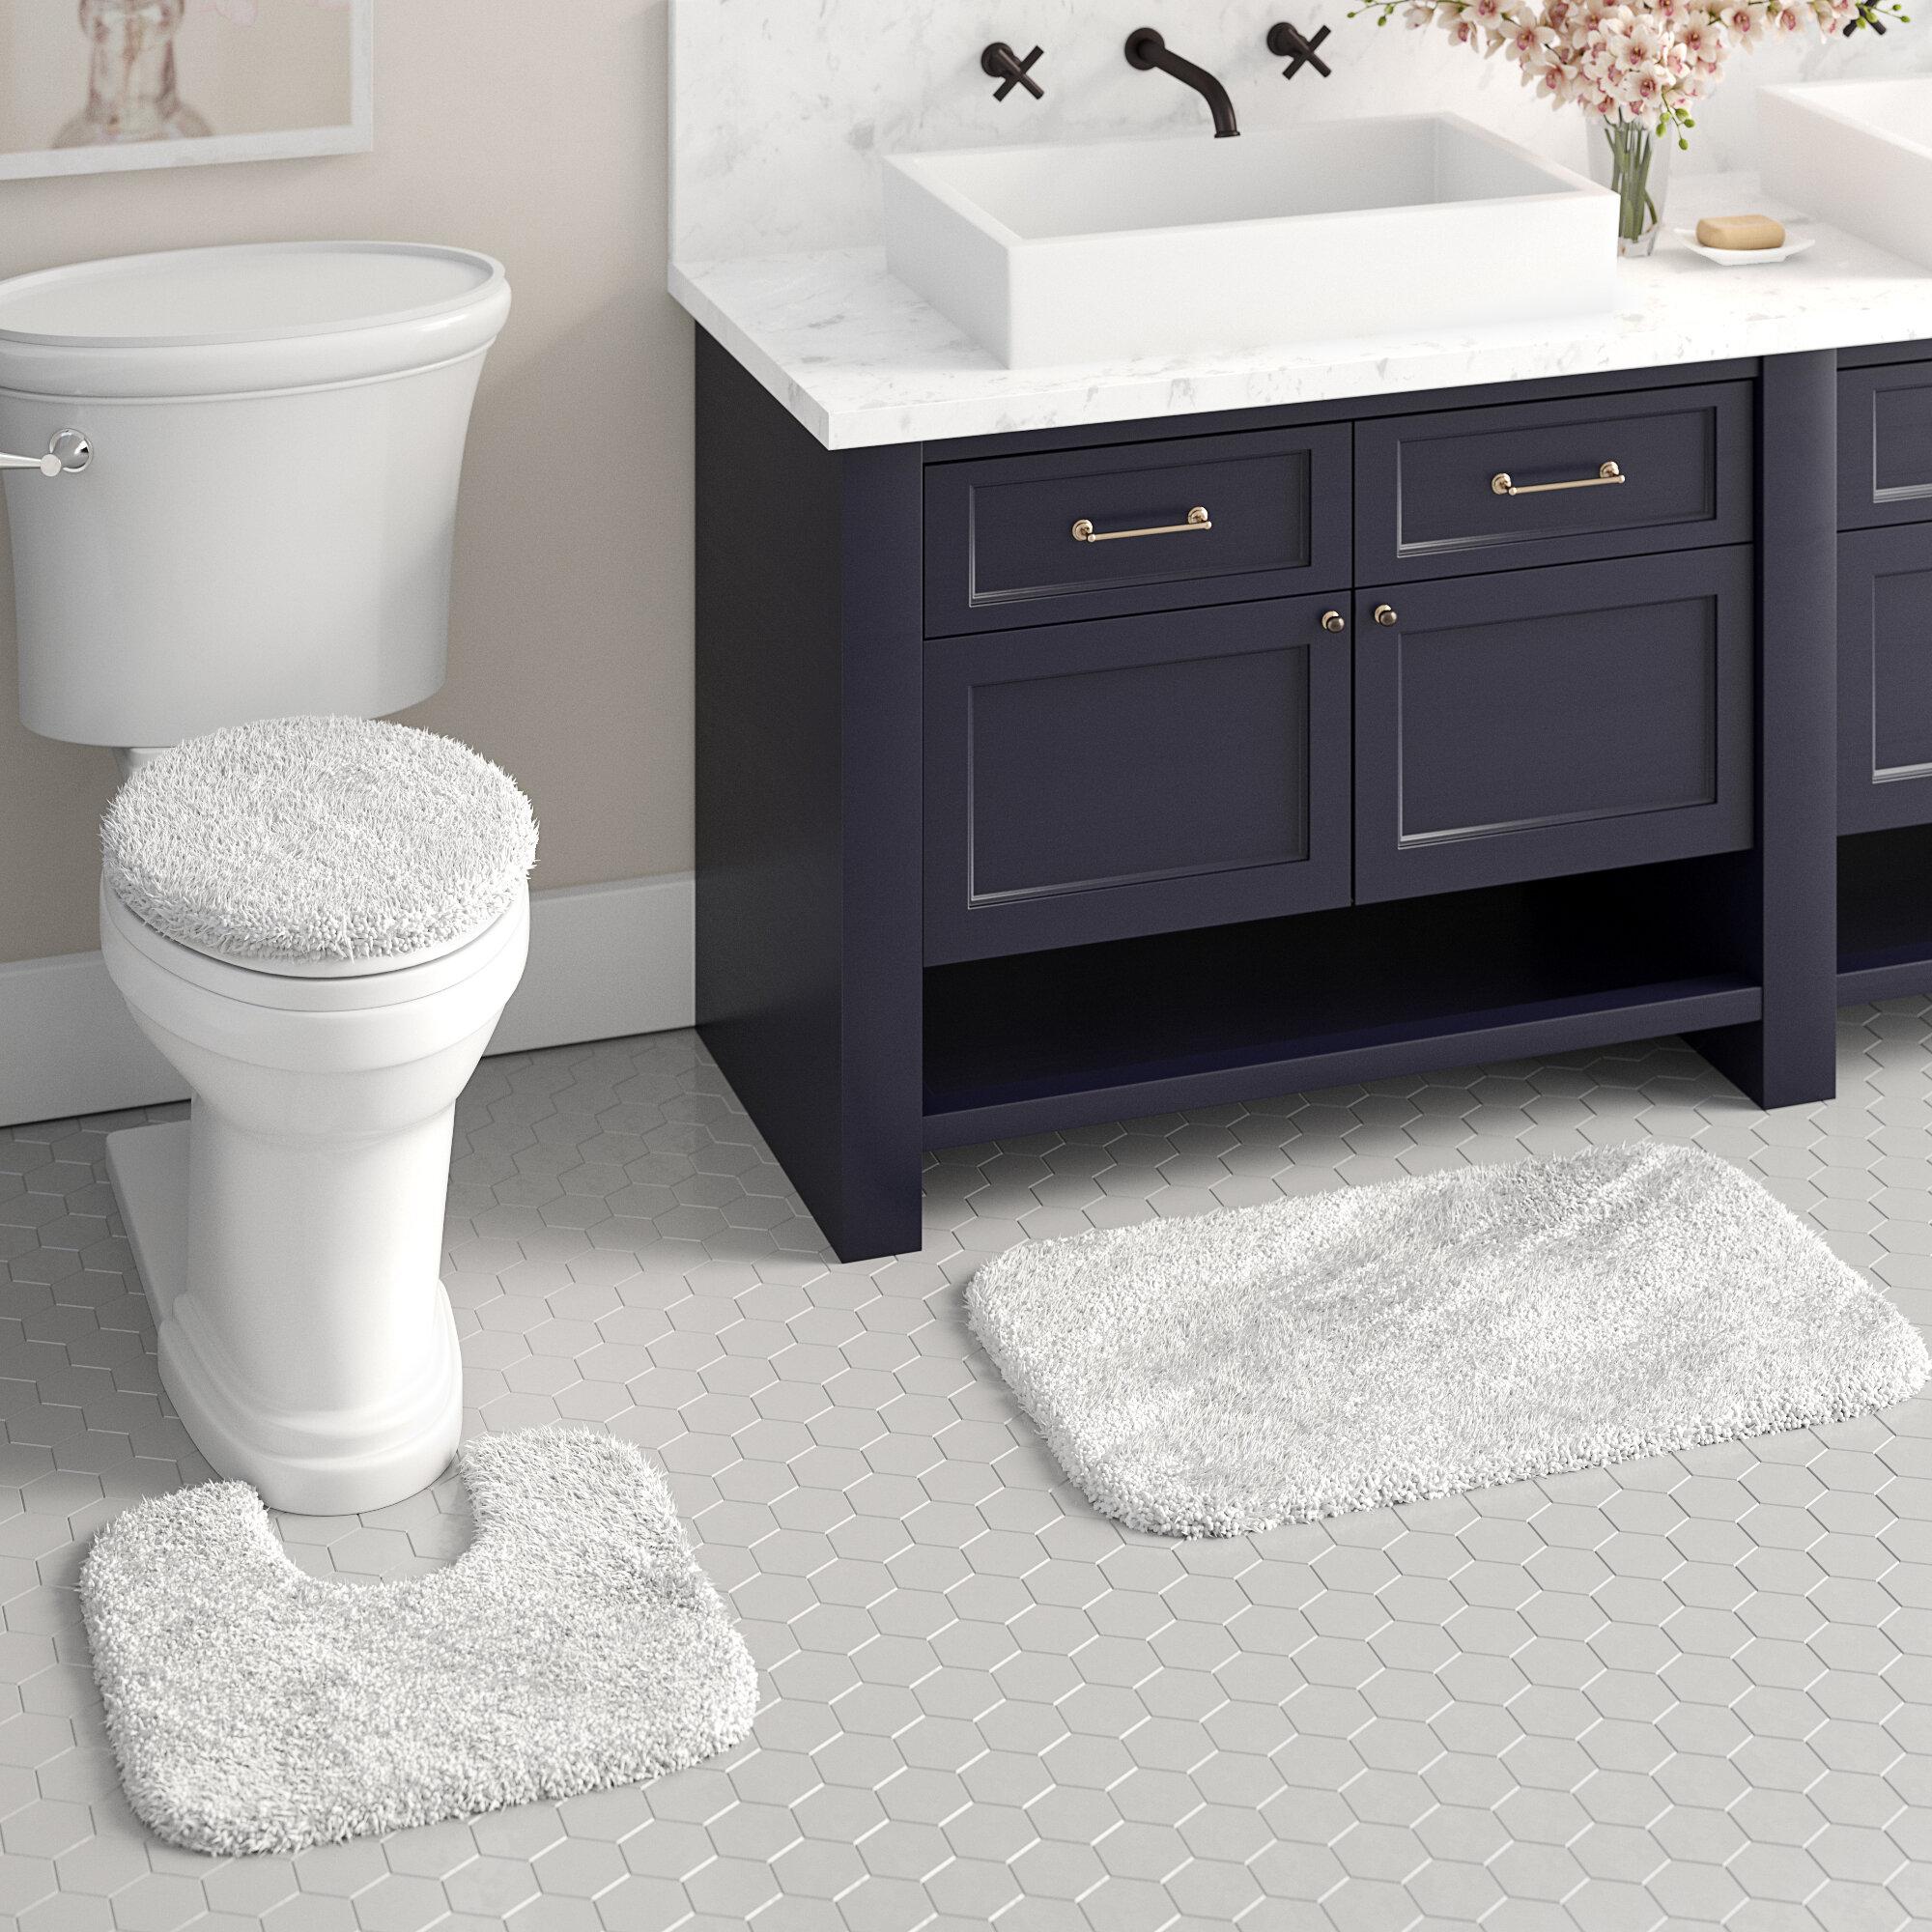 Black Toilet Lid Cover Elongated Fun Soft Top Non Slip Plush Nylon Washable Bath